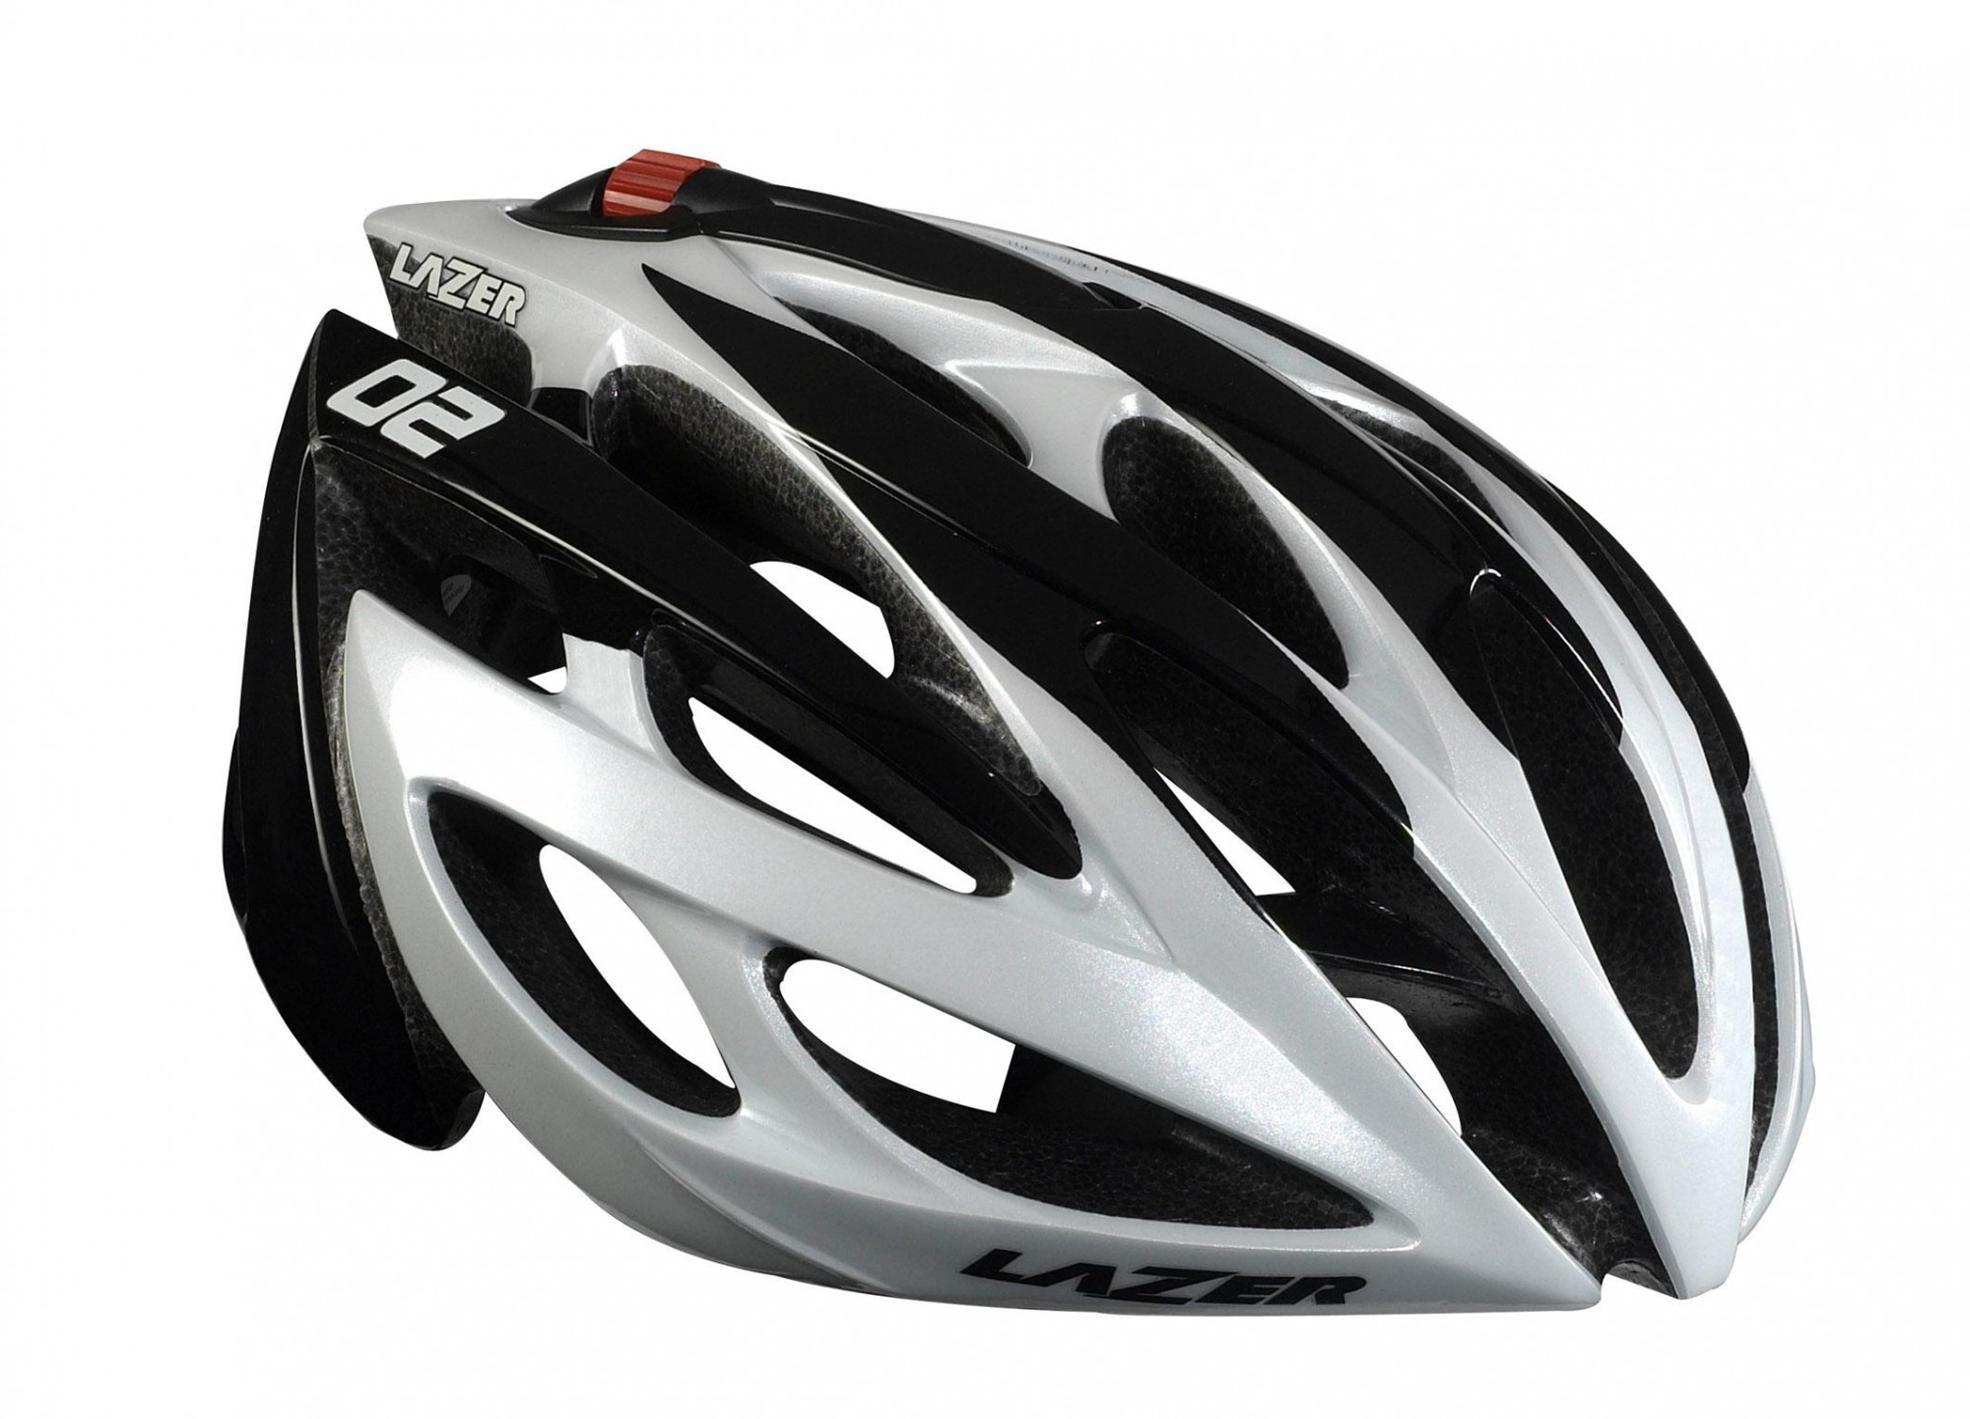 lazer o2 bicycle helmet image